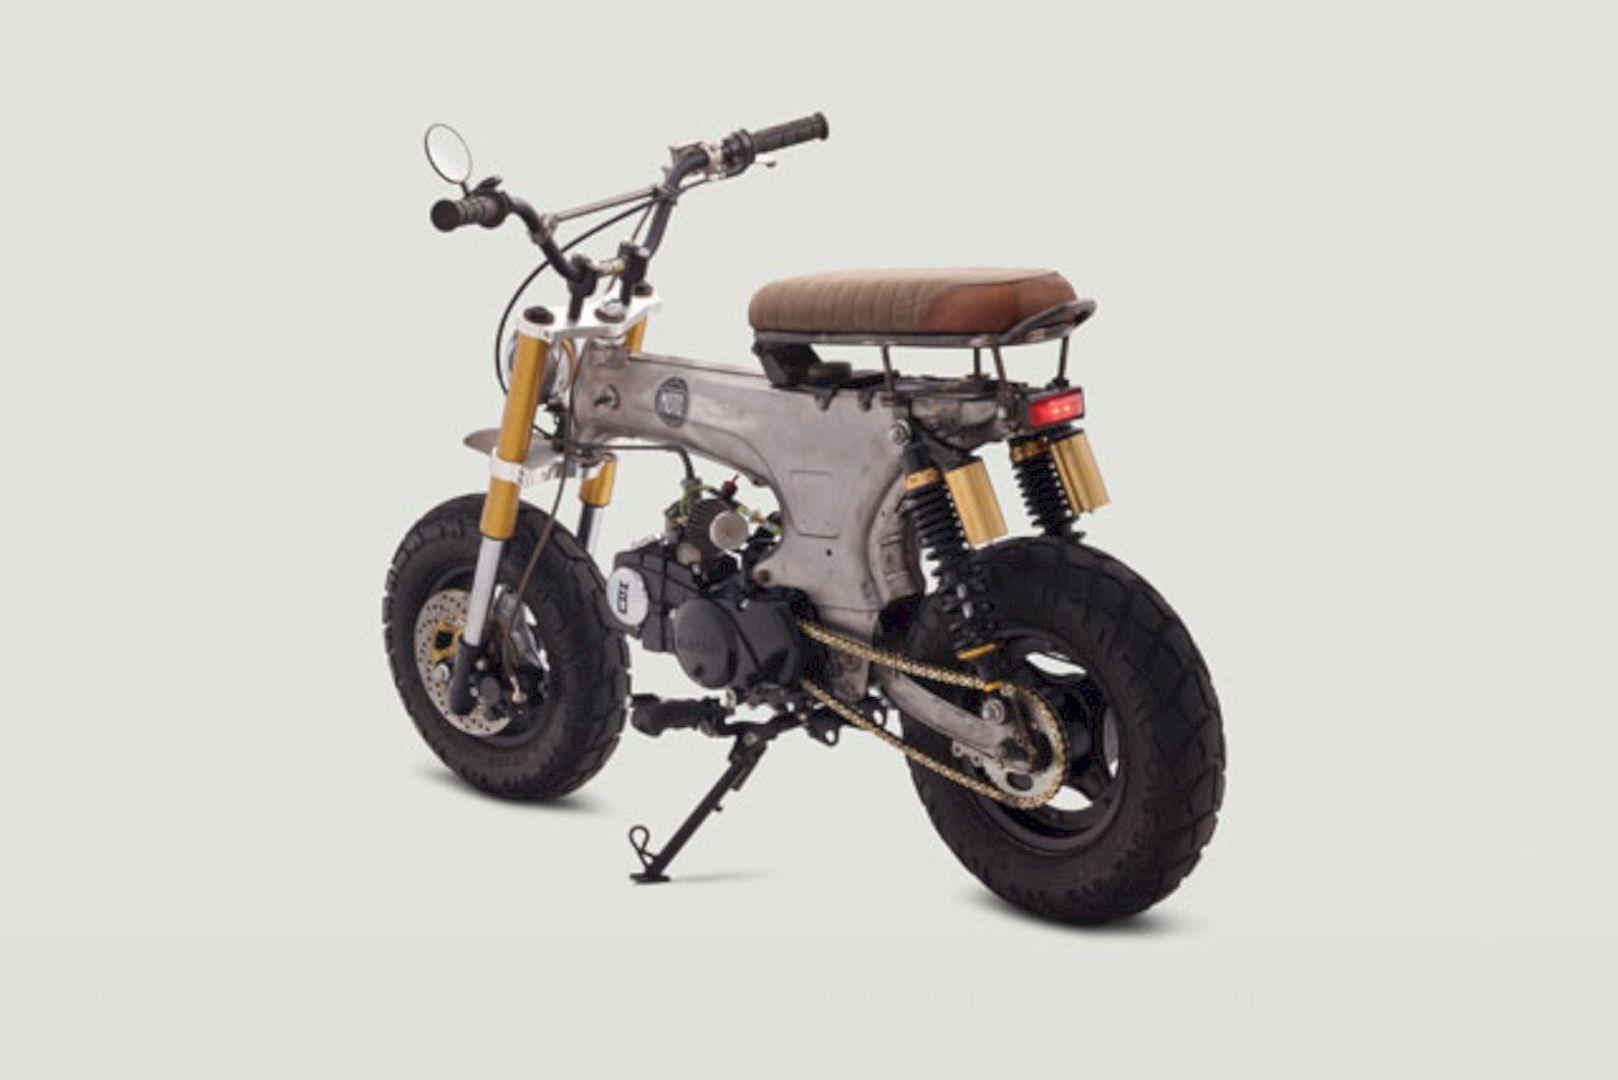 Honda Ct70 Scrambler Junior By Classified Moto Livin The Dream